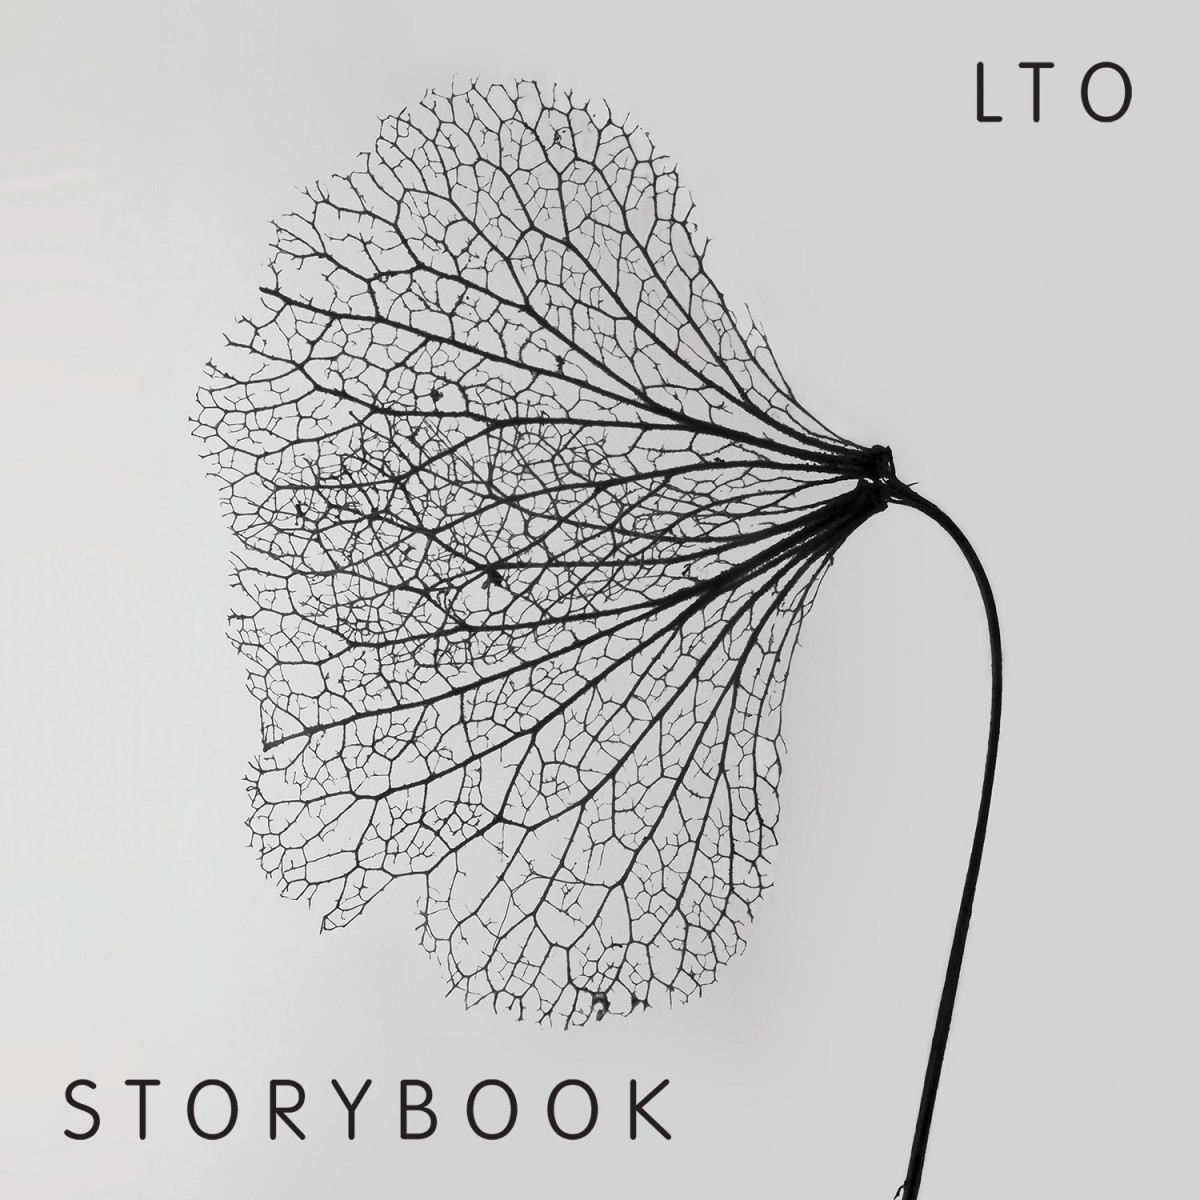 LTO Storybook Artwork